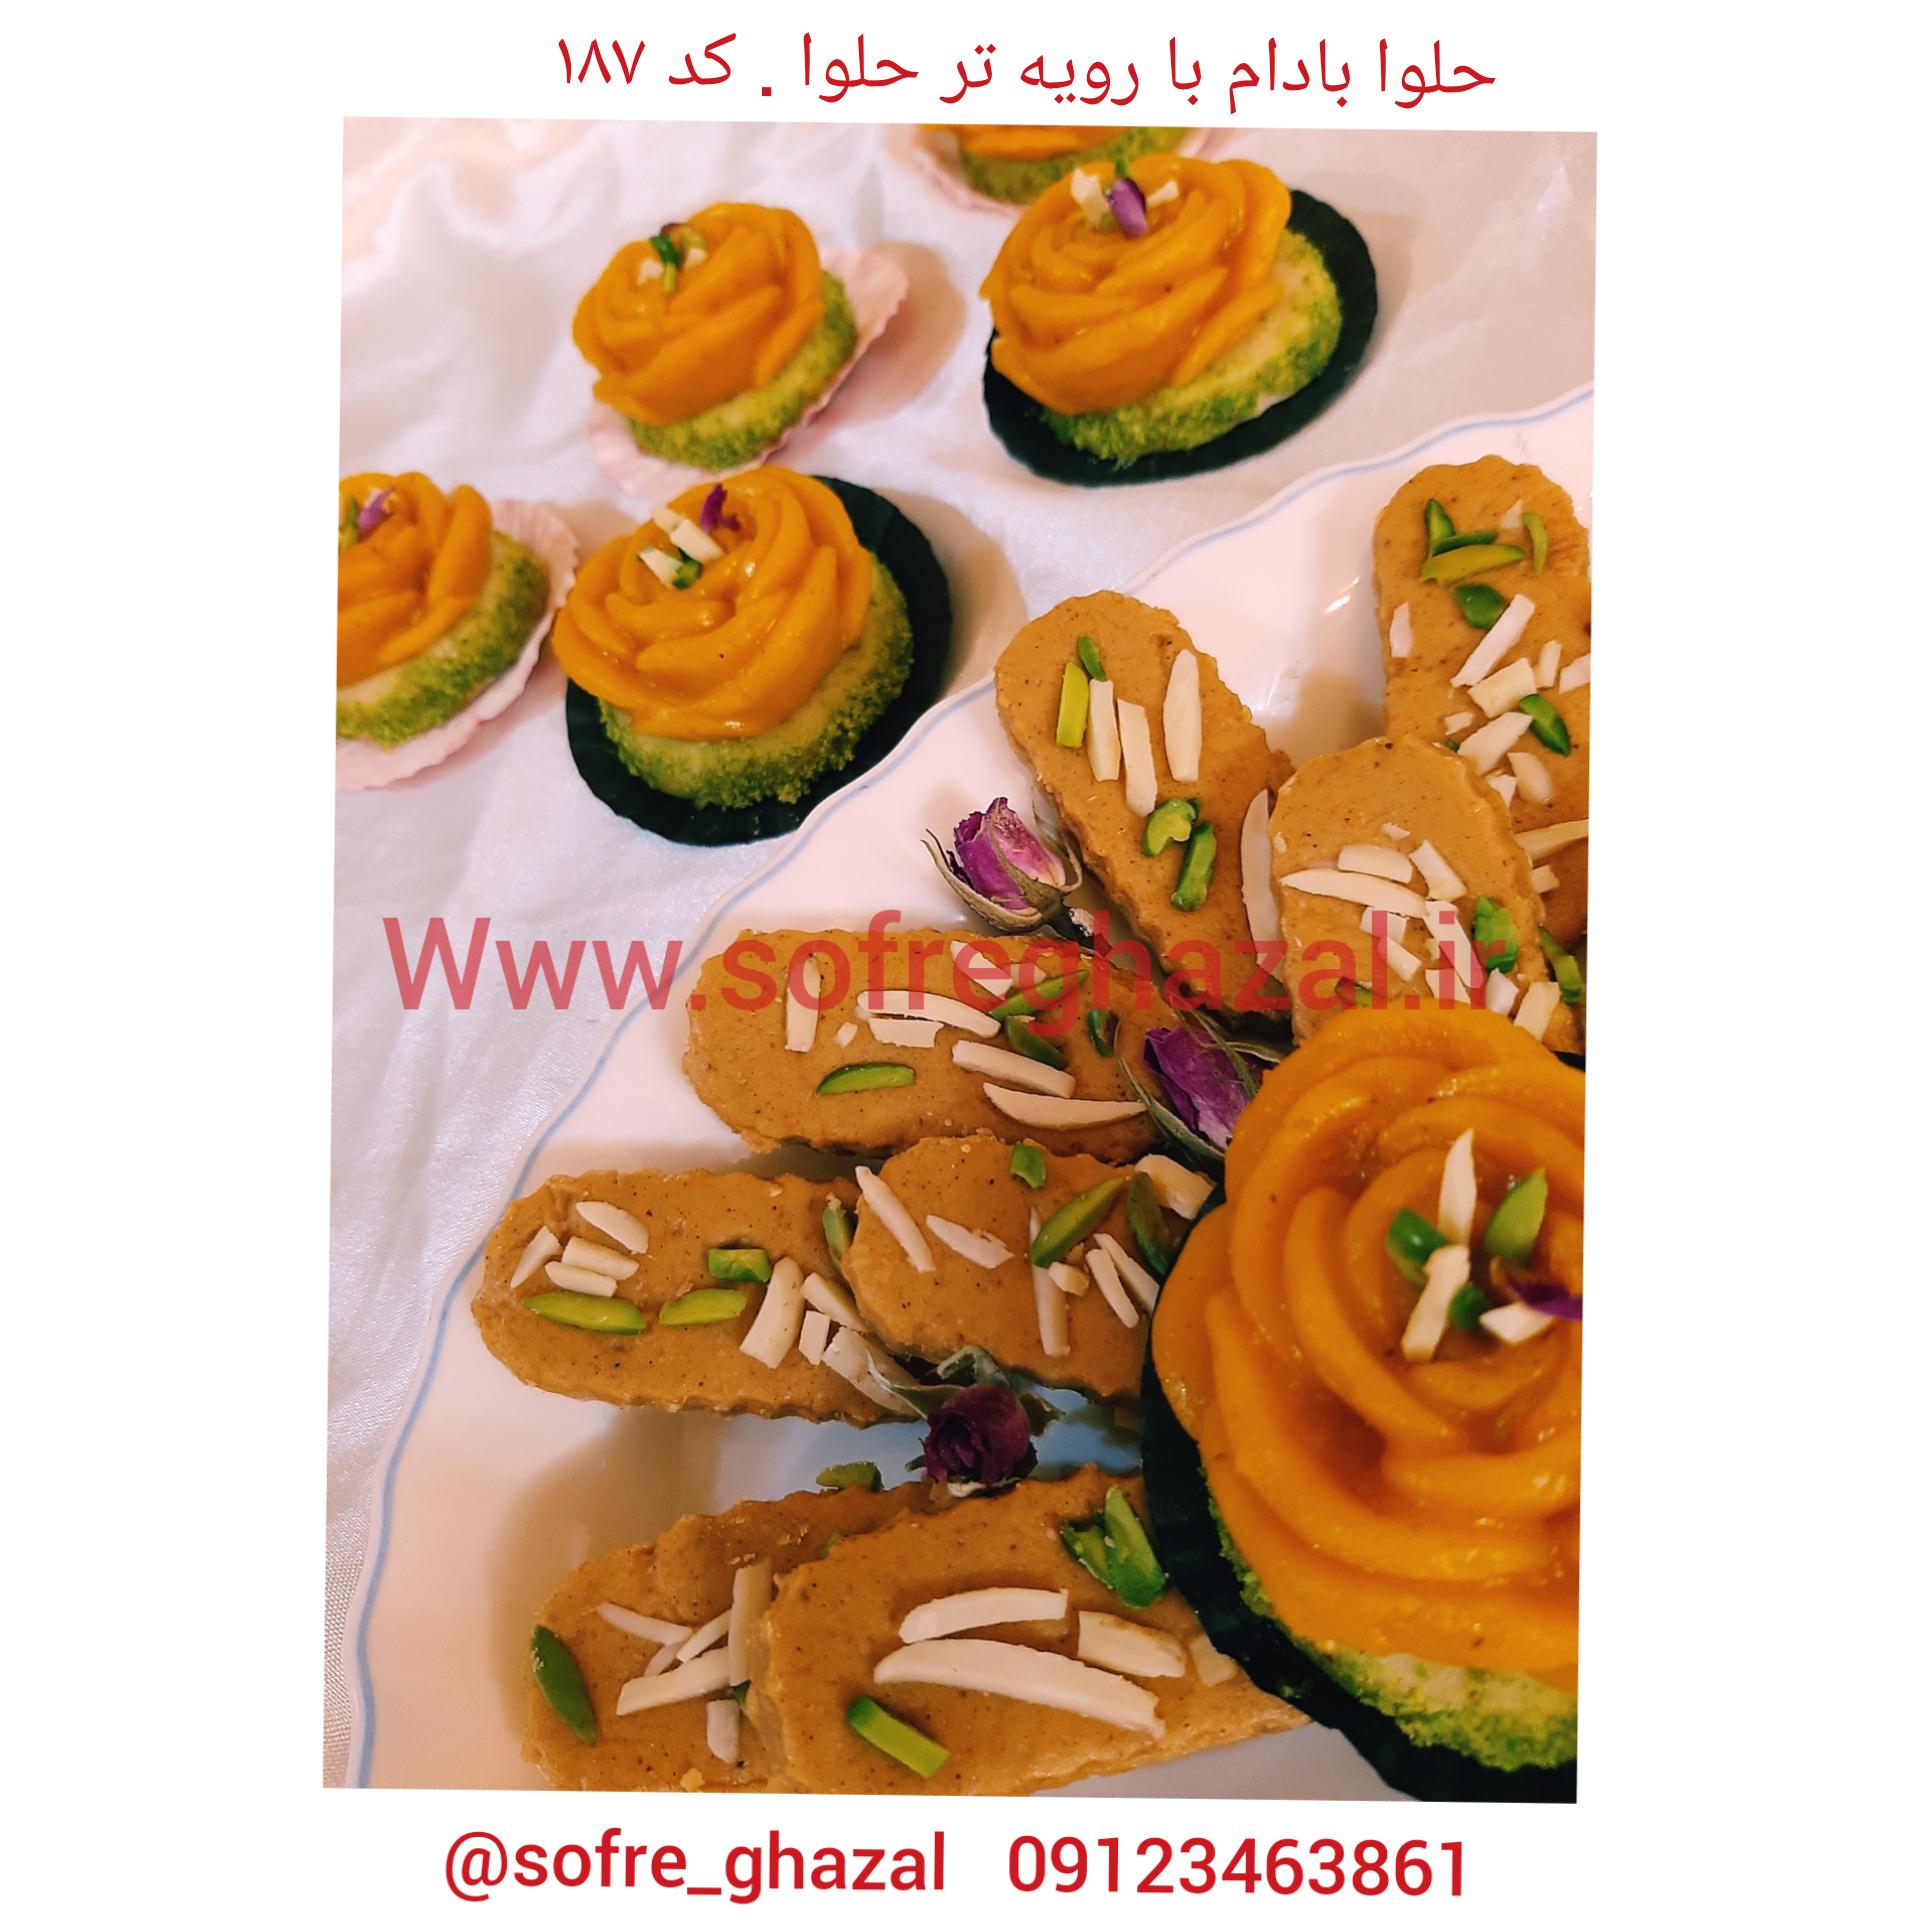 PhotoCollage_20210101_204358240